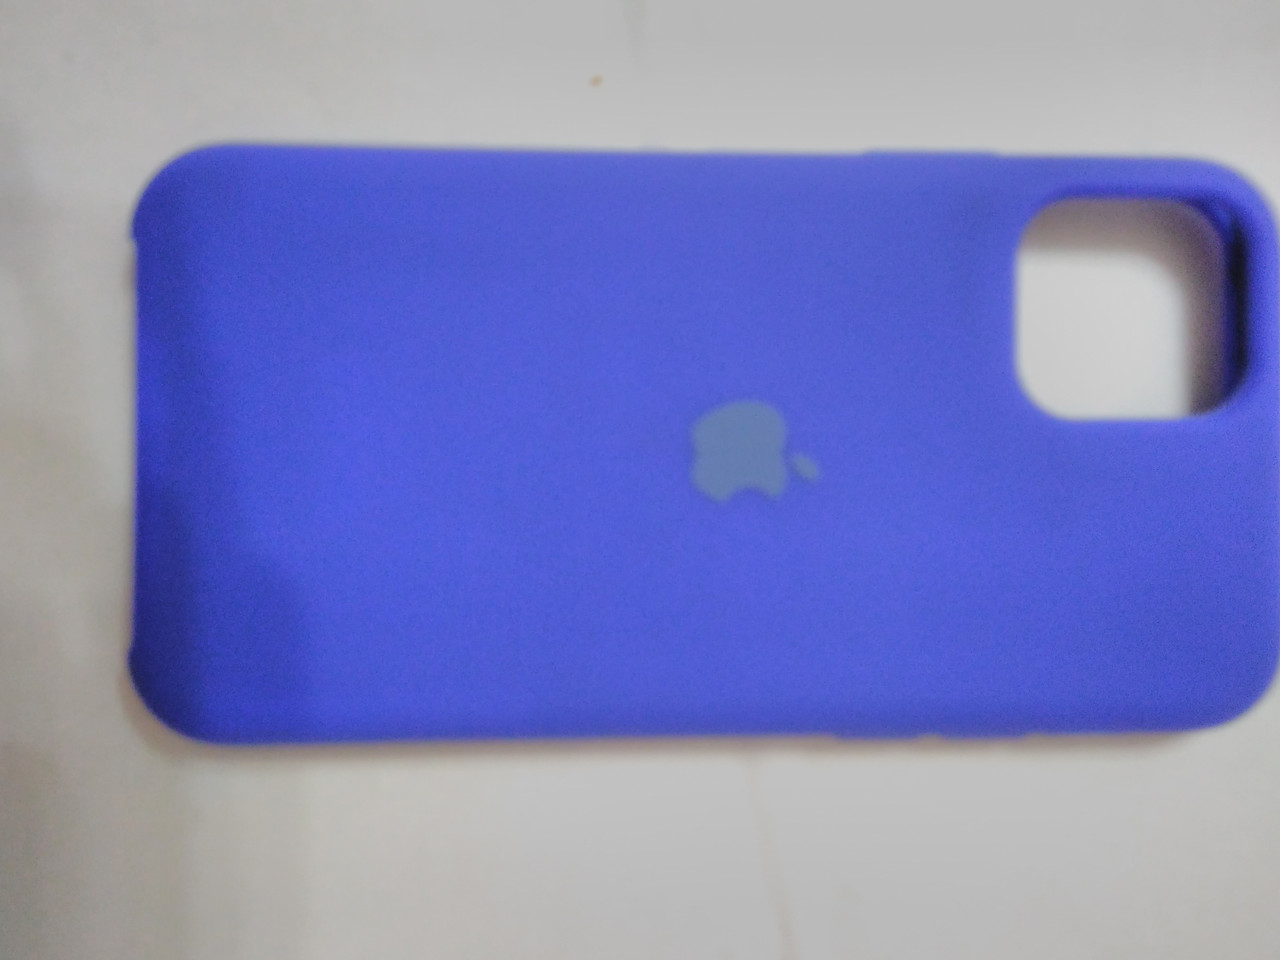 Накладка Silicon Case Original для iPhone 11 Pro 2019 (синій)